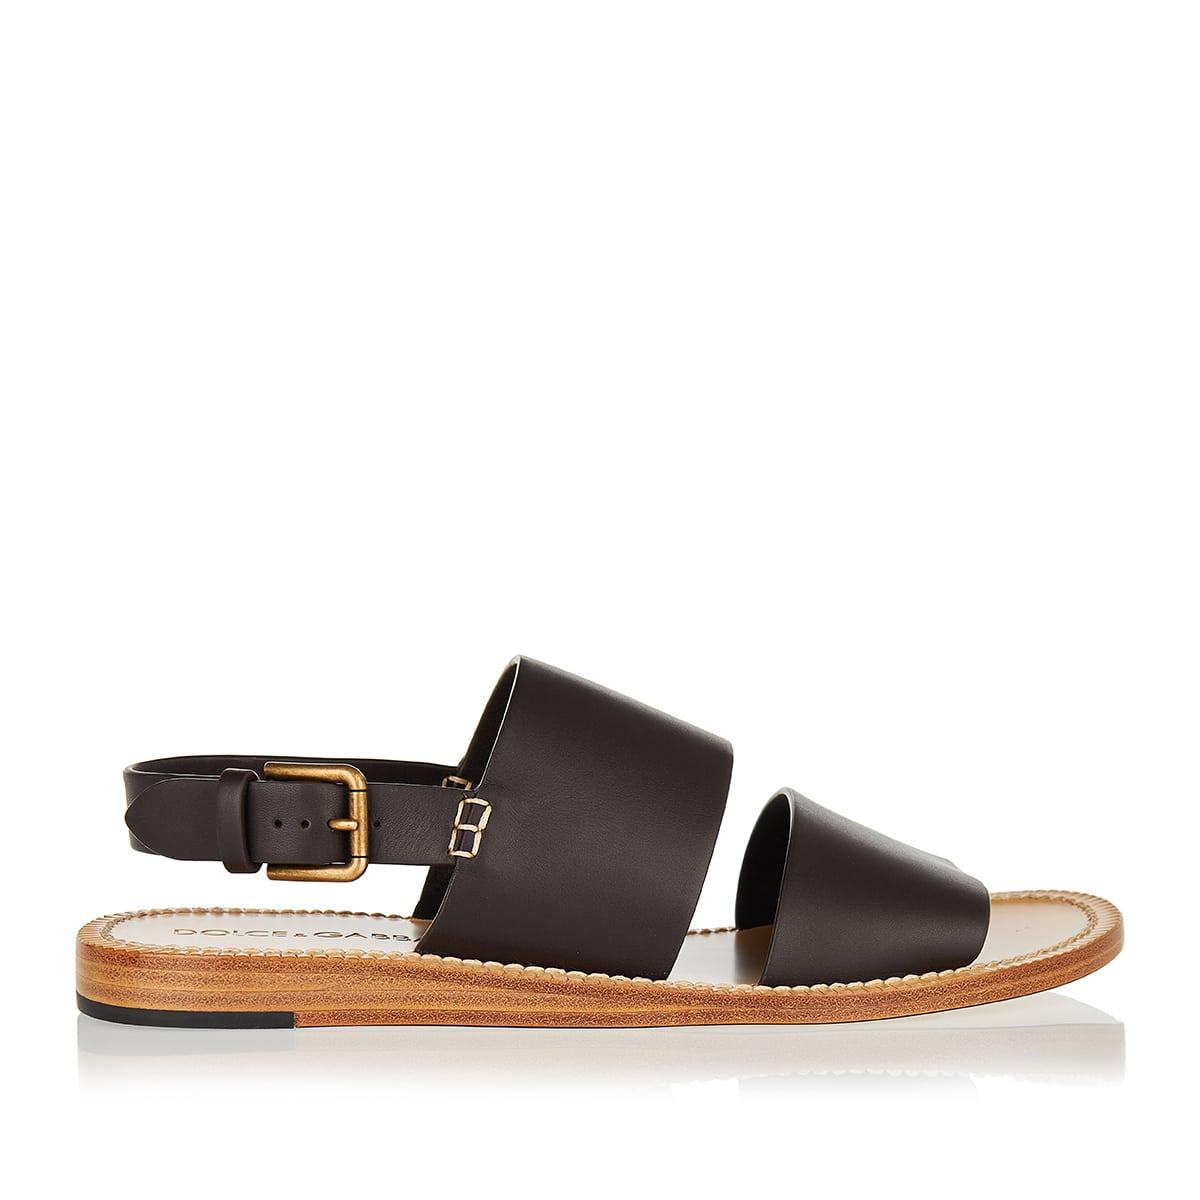 Pantheon leather sandals